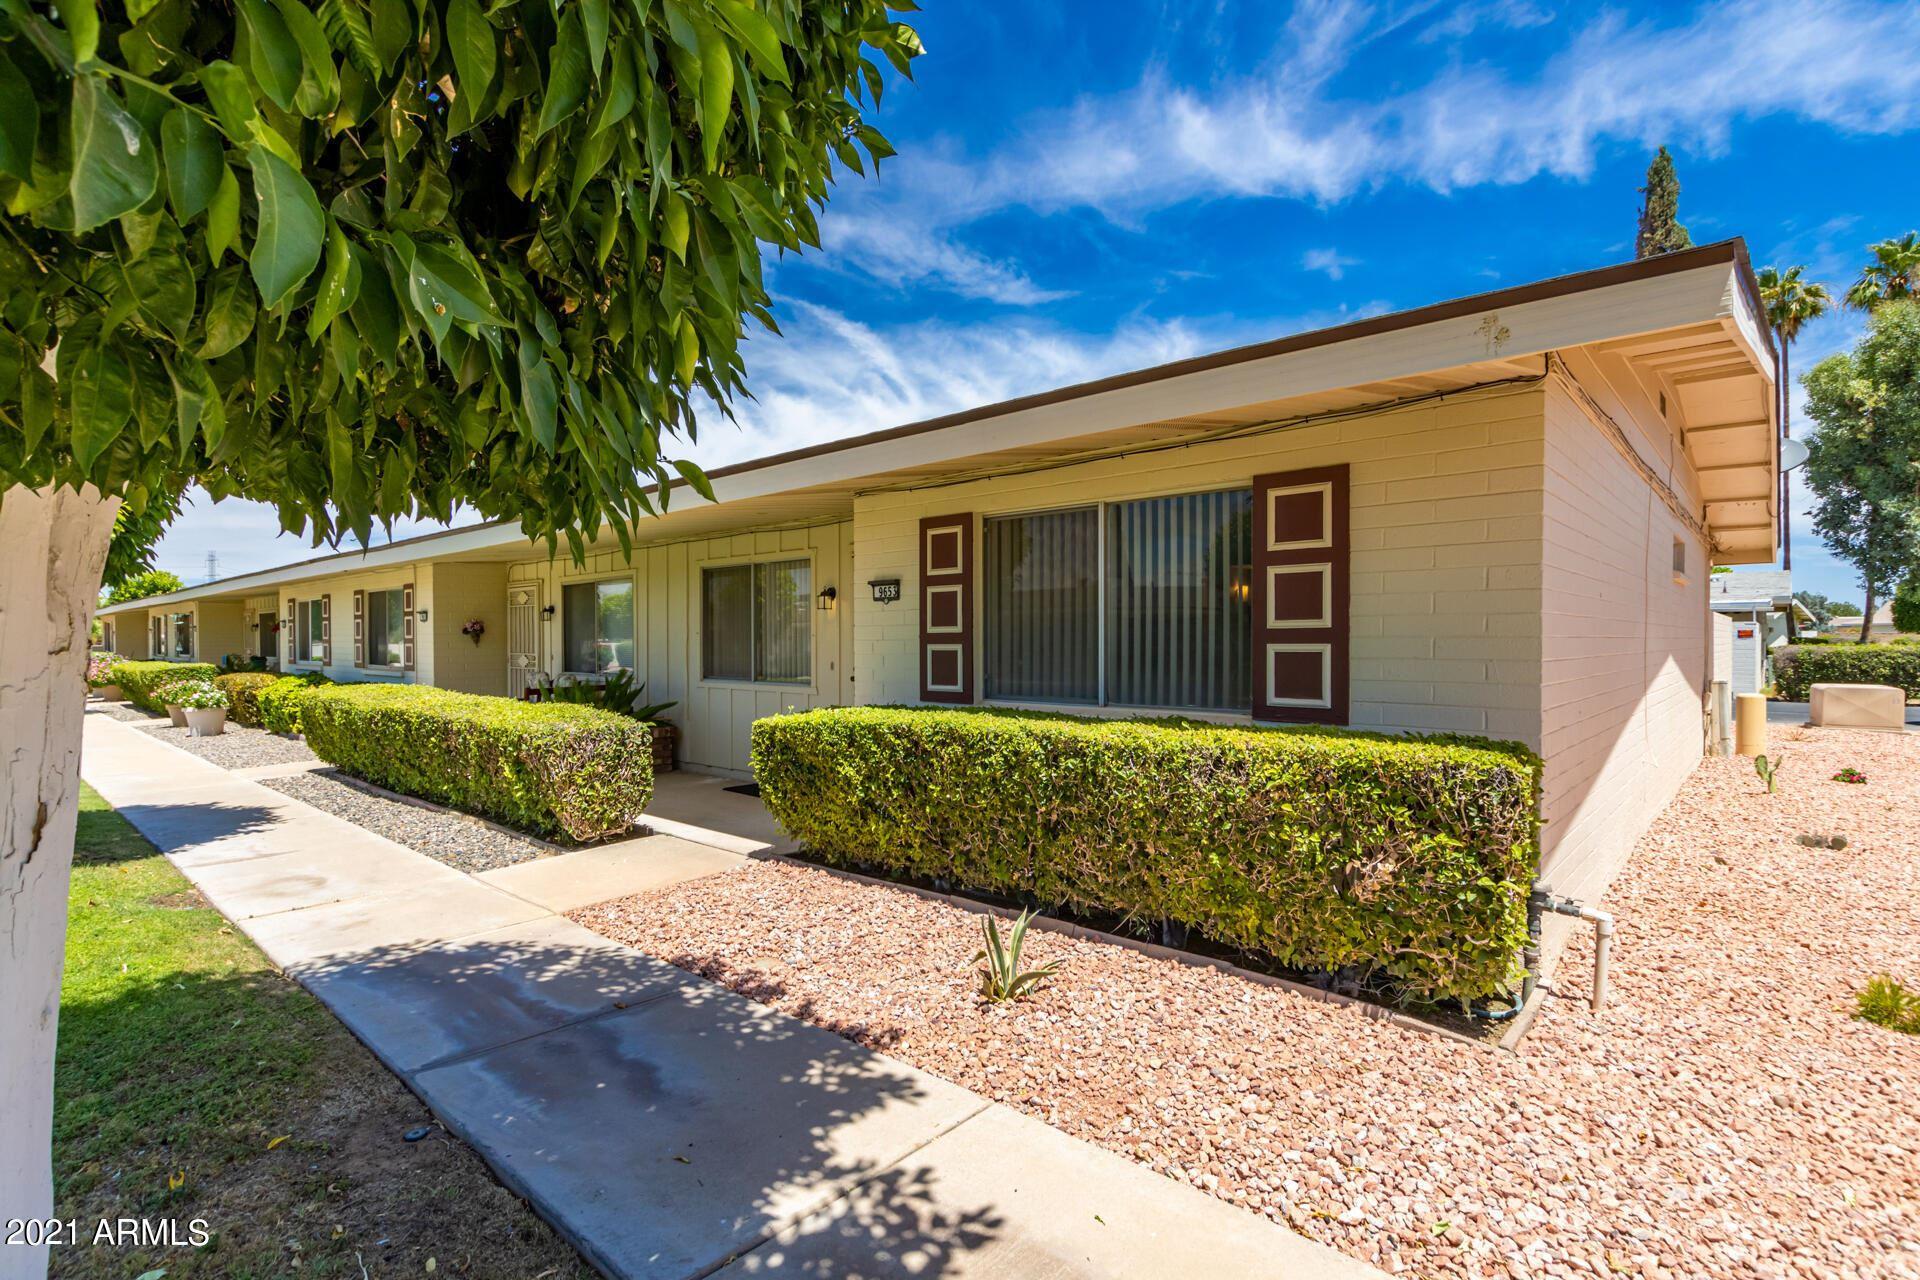 Photo of 9653 N 111TH Avenue, Sun City, AZ 85351 (MLS # 6249320)